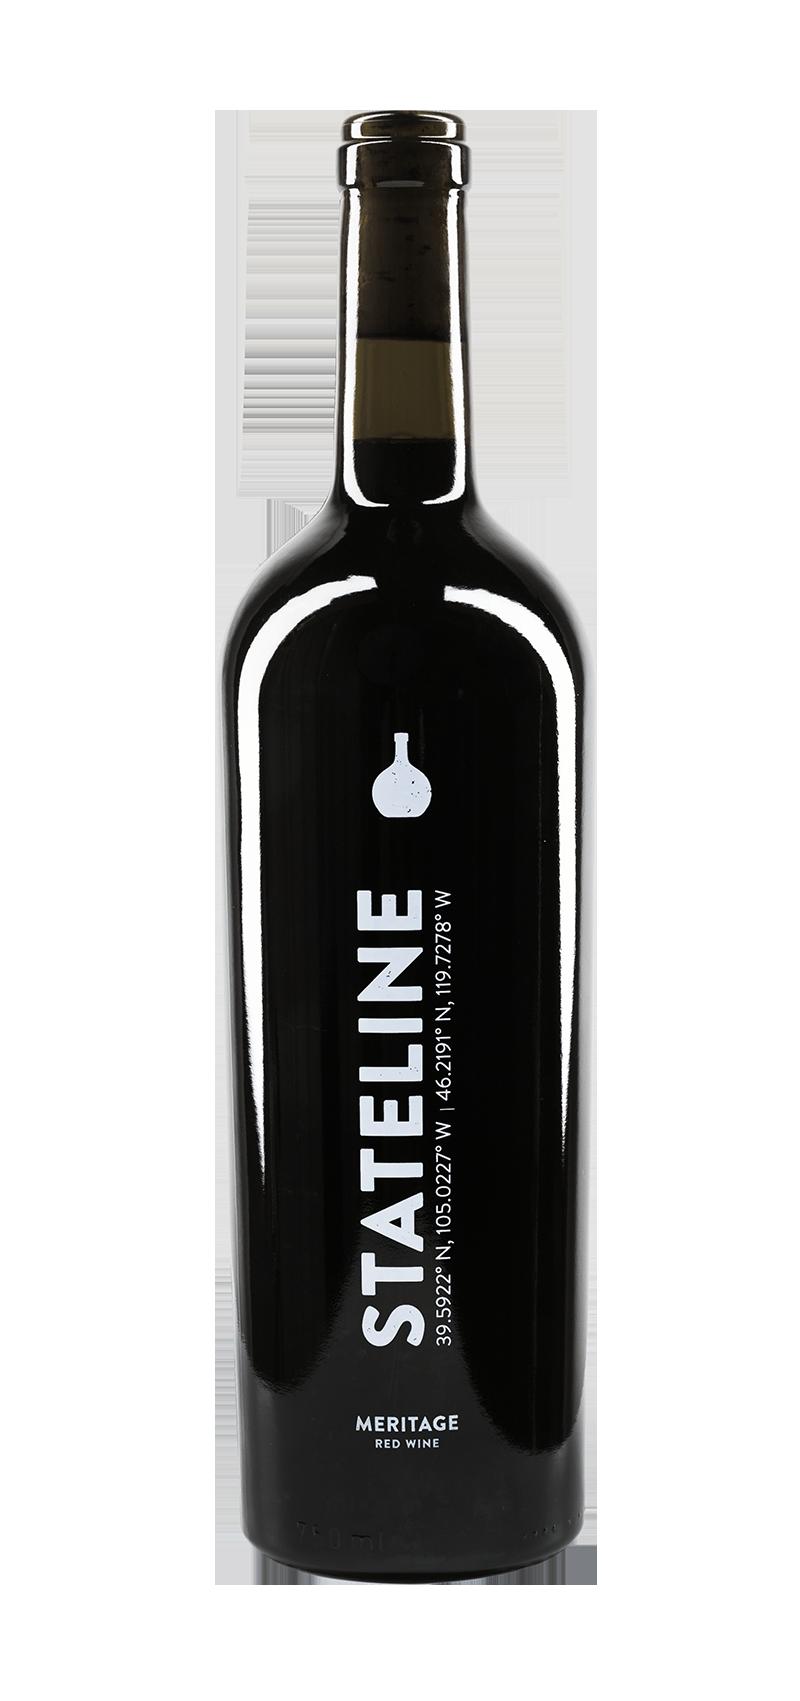 Bottle of Carboy Winery's Stateline Meritage wine.